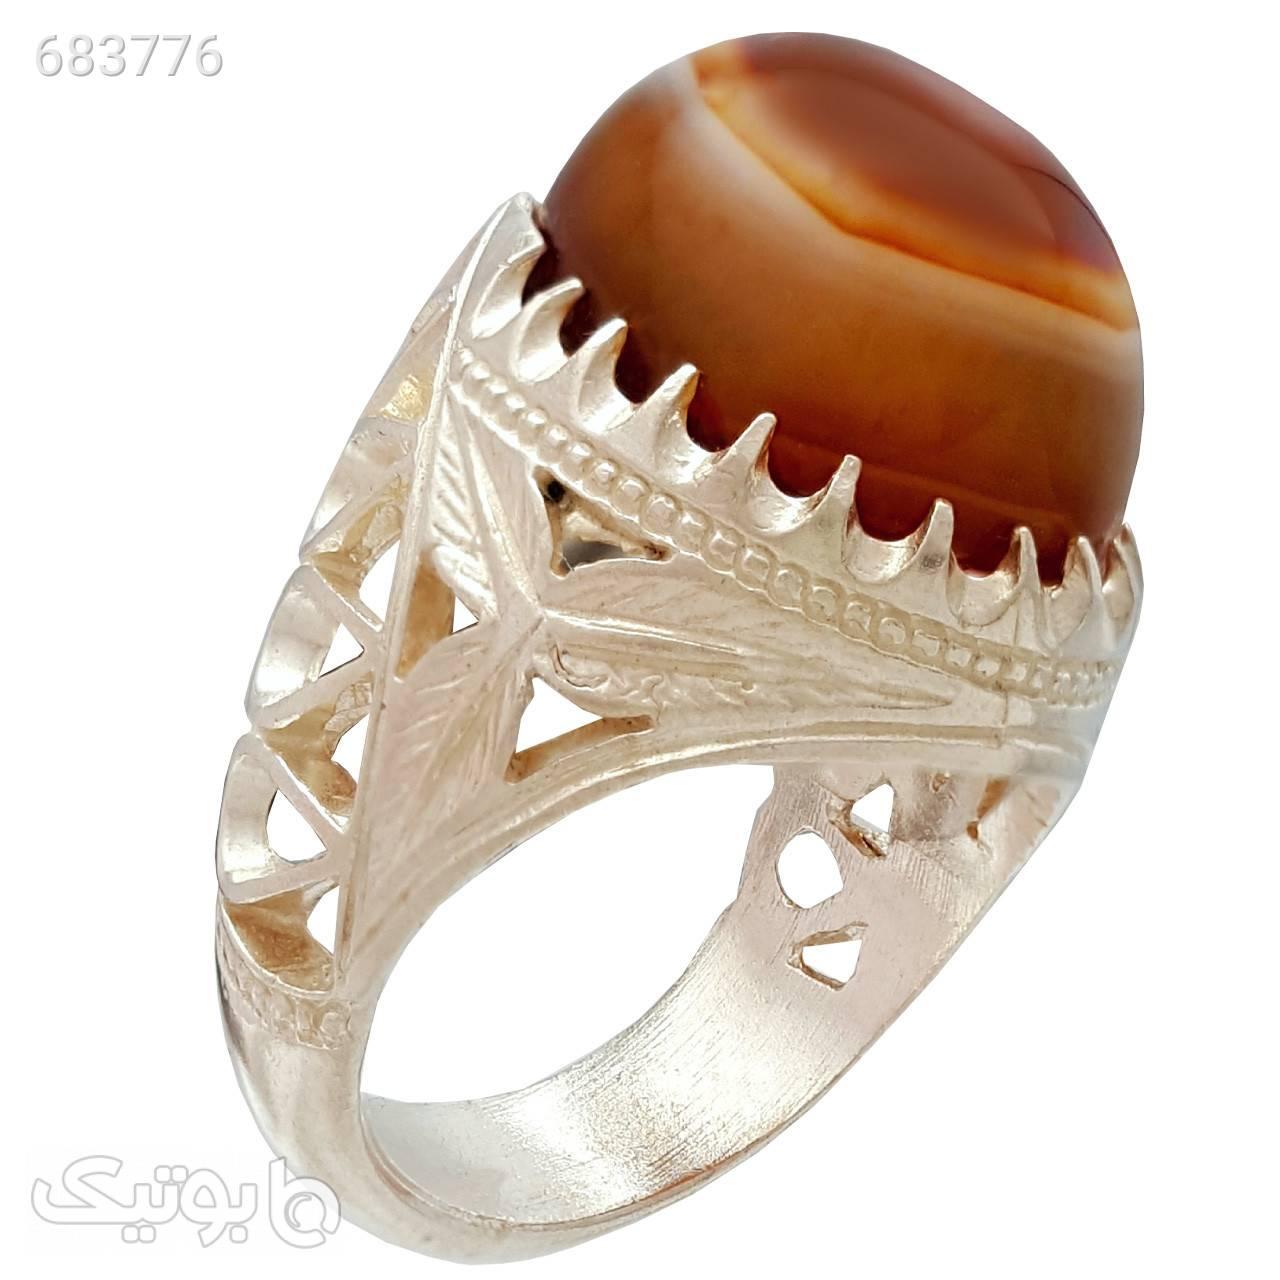 انگشتر نقره مردانه مدل a112jw نقره ای انگشتر